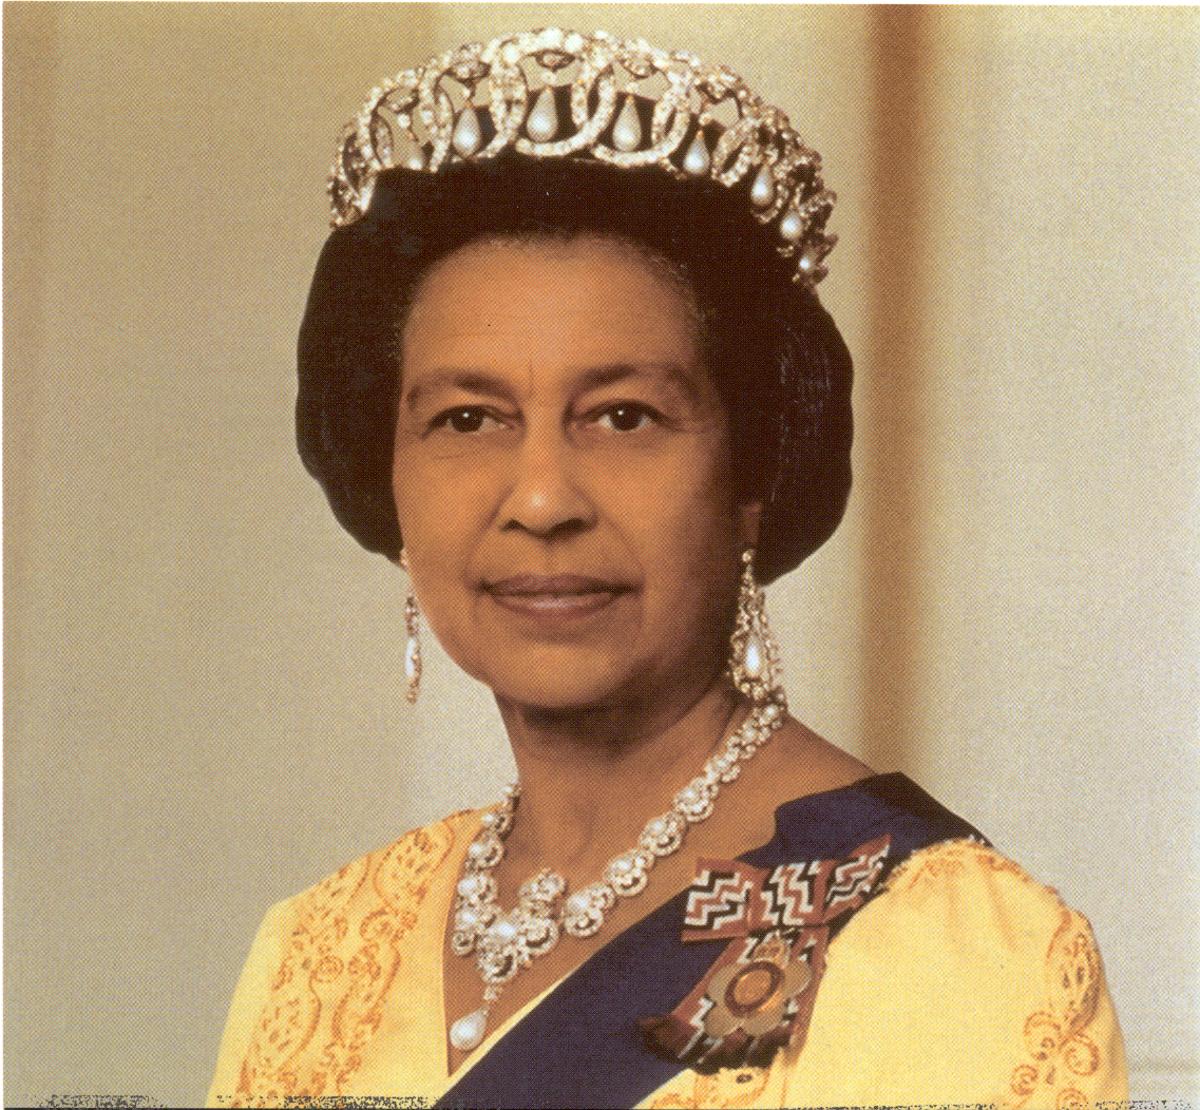 British Royal Family Shocker - Queen Elizabeth II is Black